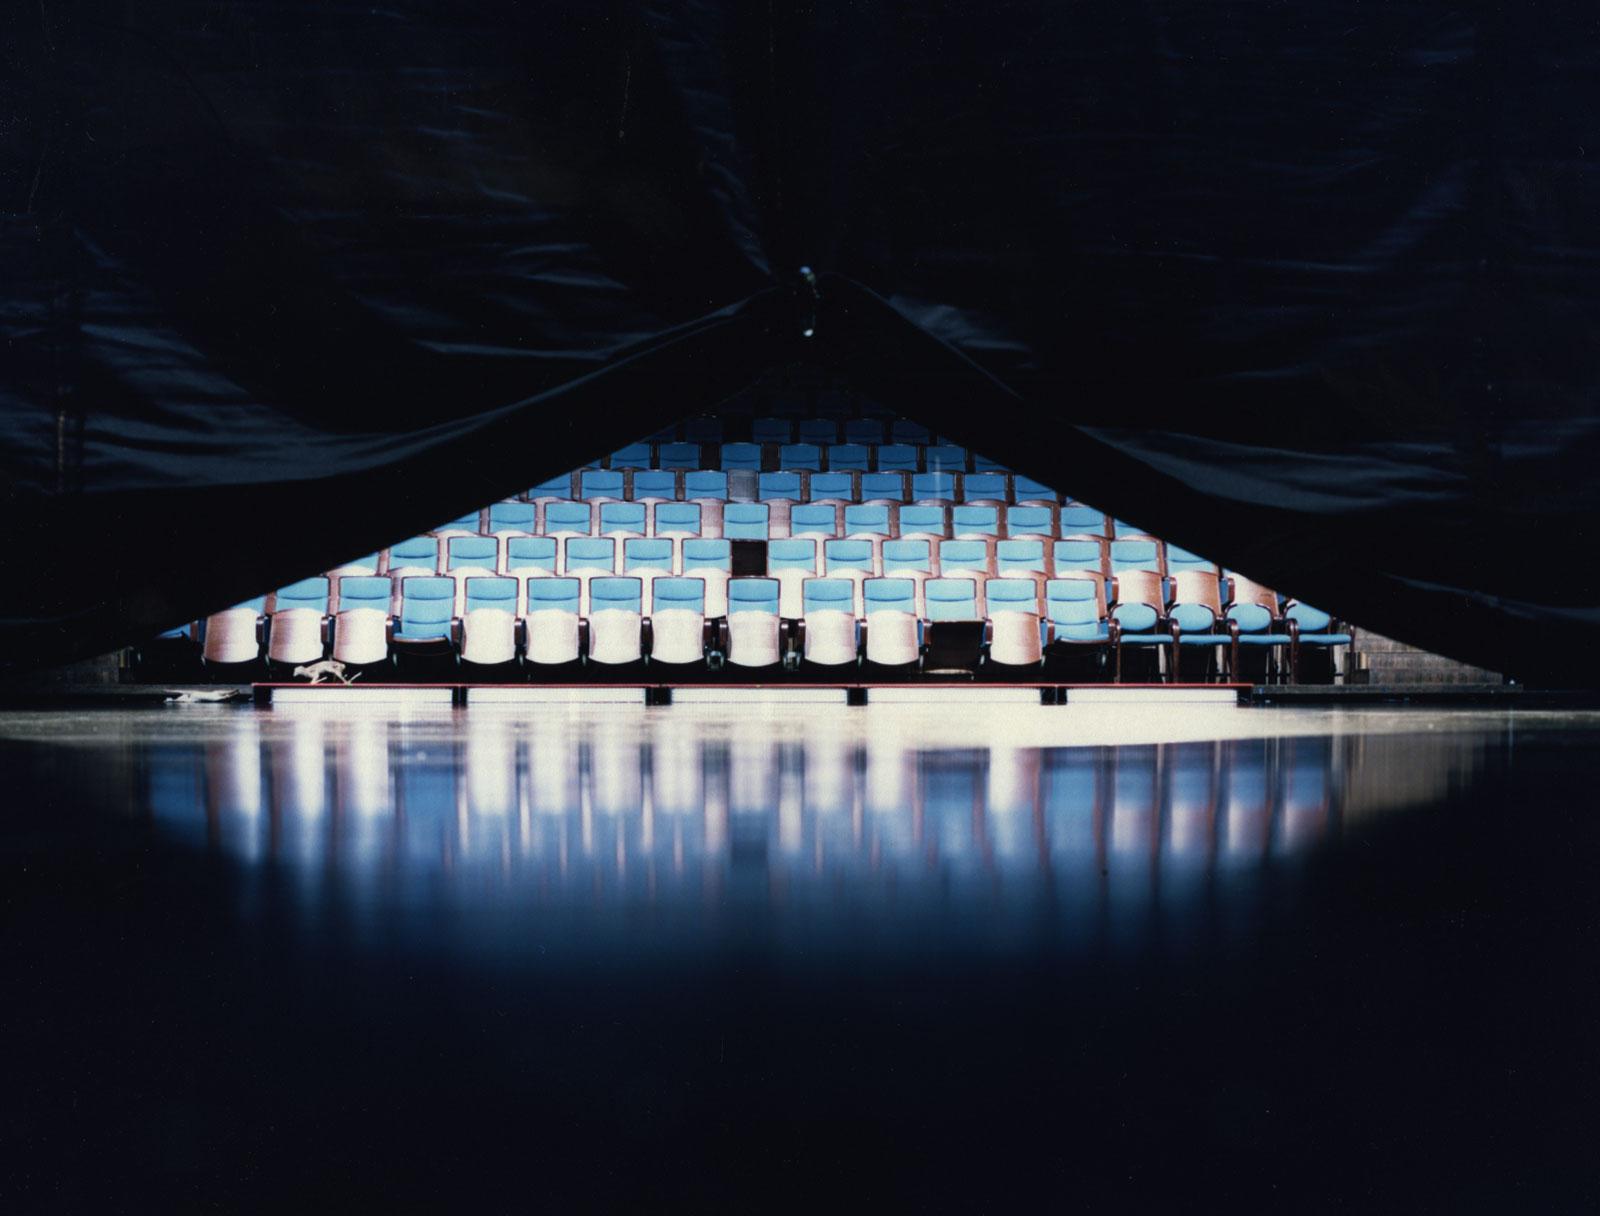 Stage curtain, 2016, C-print, 80 x 100 cm, ed. 5